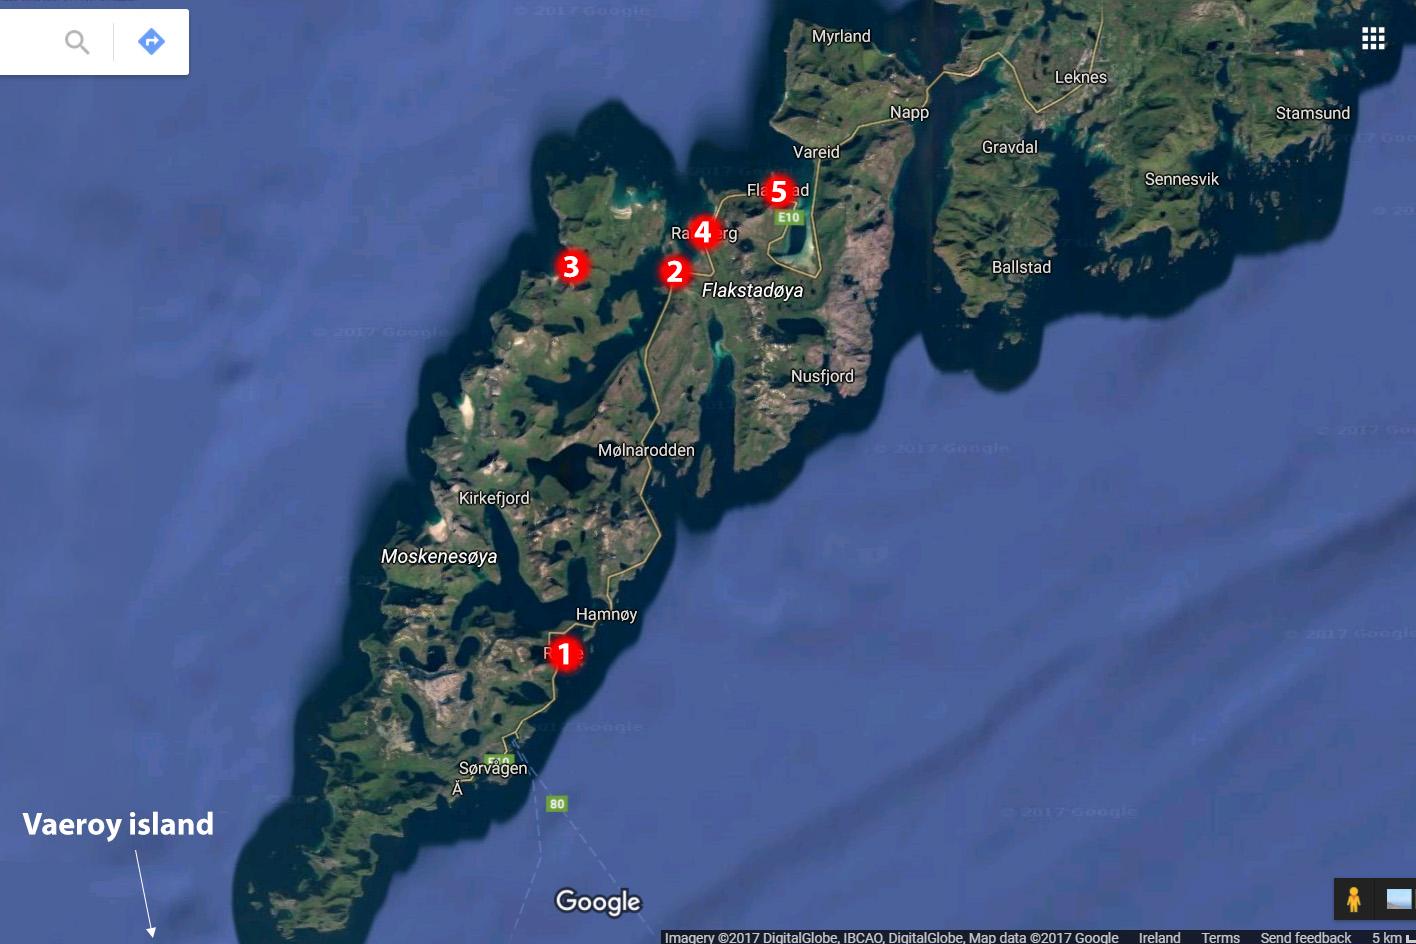 Lofoten map - Moskenesoya and Flakstadoya islands